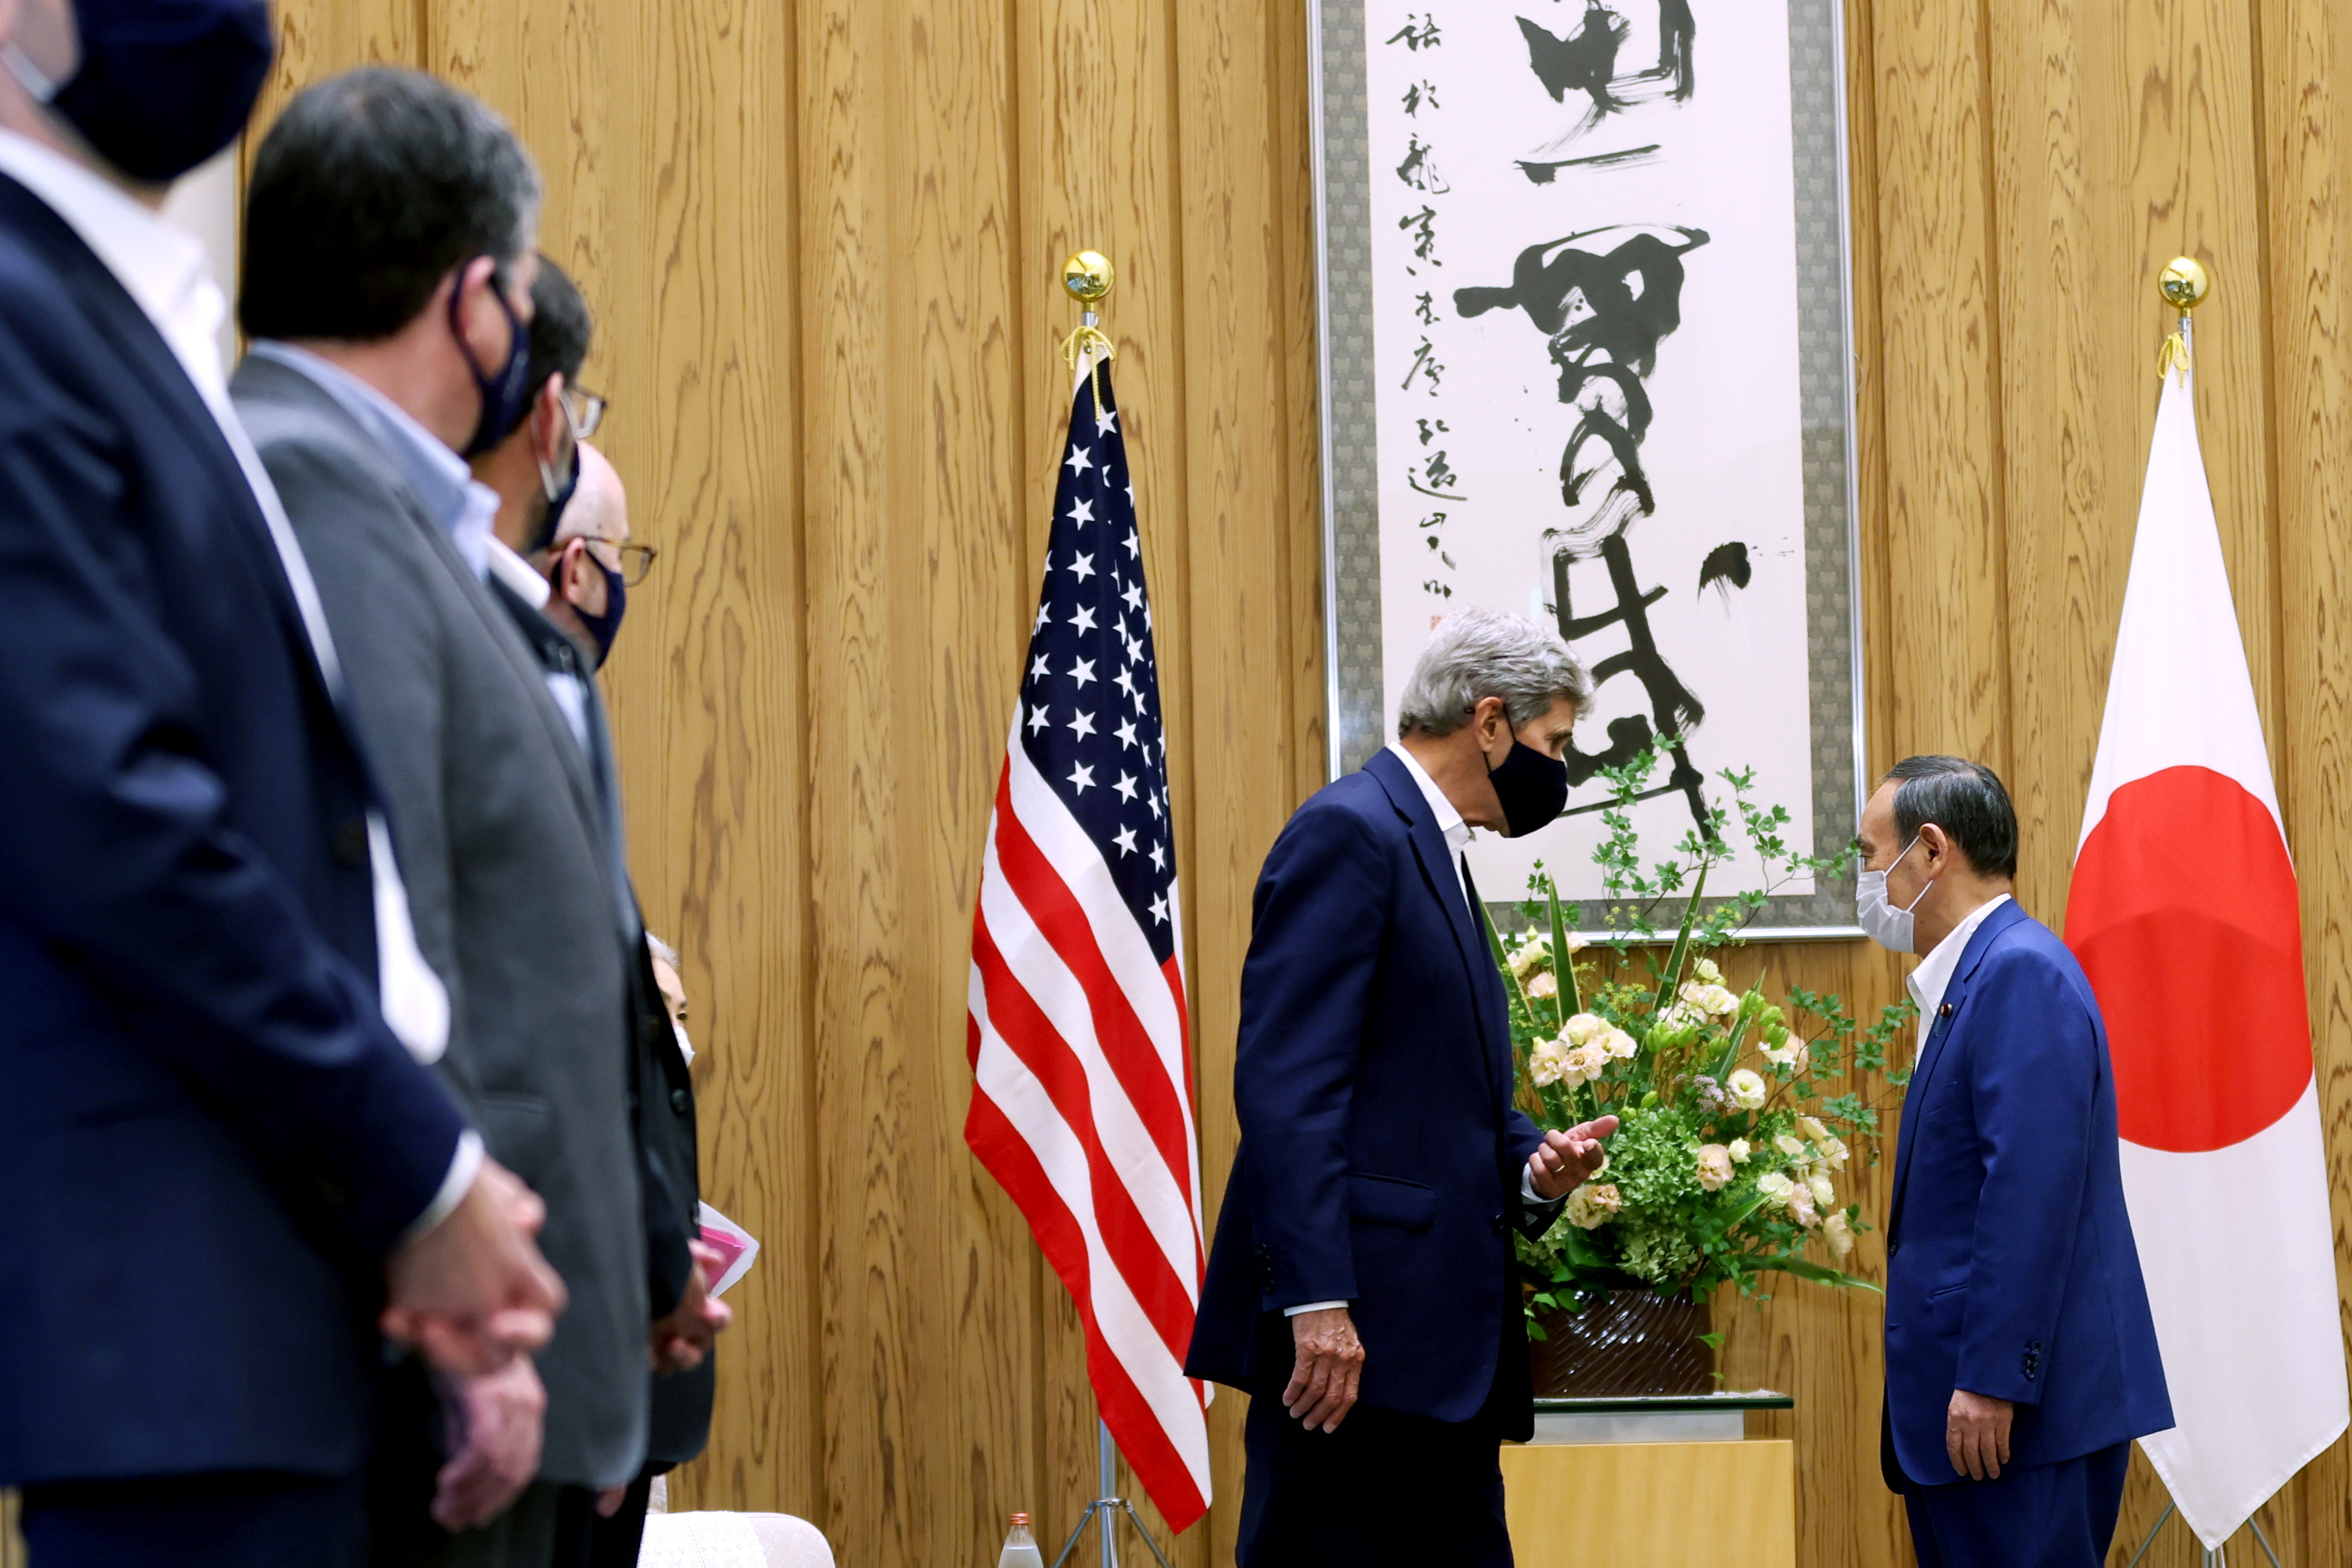 Japan's Prime Minister Yoshihide Suga (R) meets with U.S. special presidential envoy for climate John Kerry in Tokyo, Japan August 31, 2021. Behrouz Mehri/Pool via REUTERS